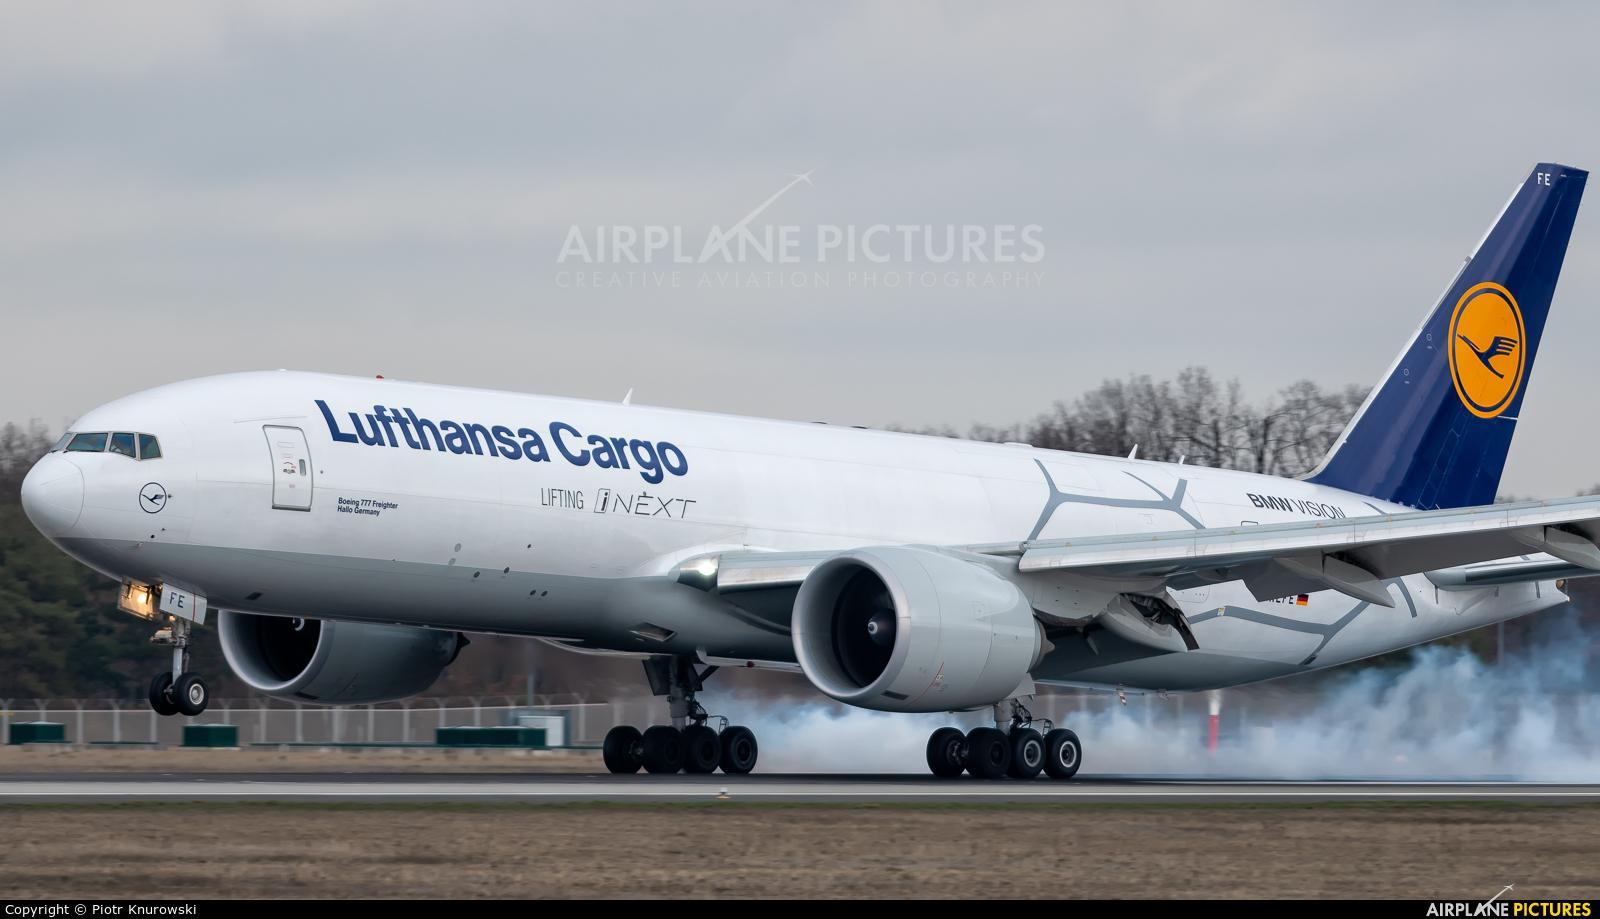 Lufthansa Cargo D-ALFE aircraft at Frankfurt